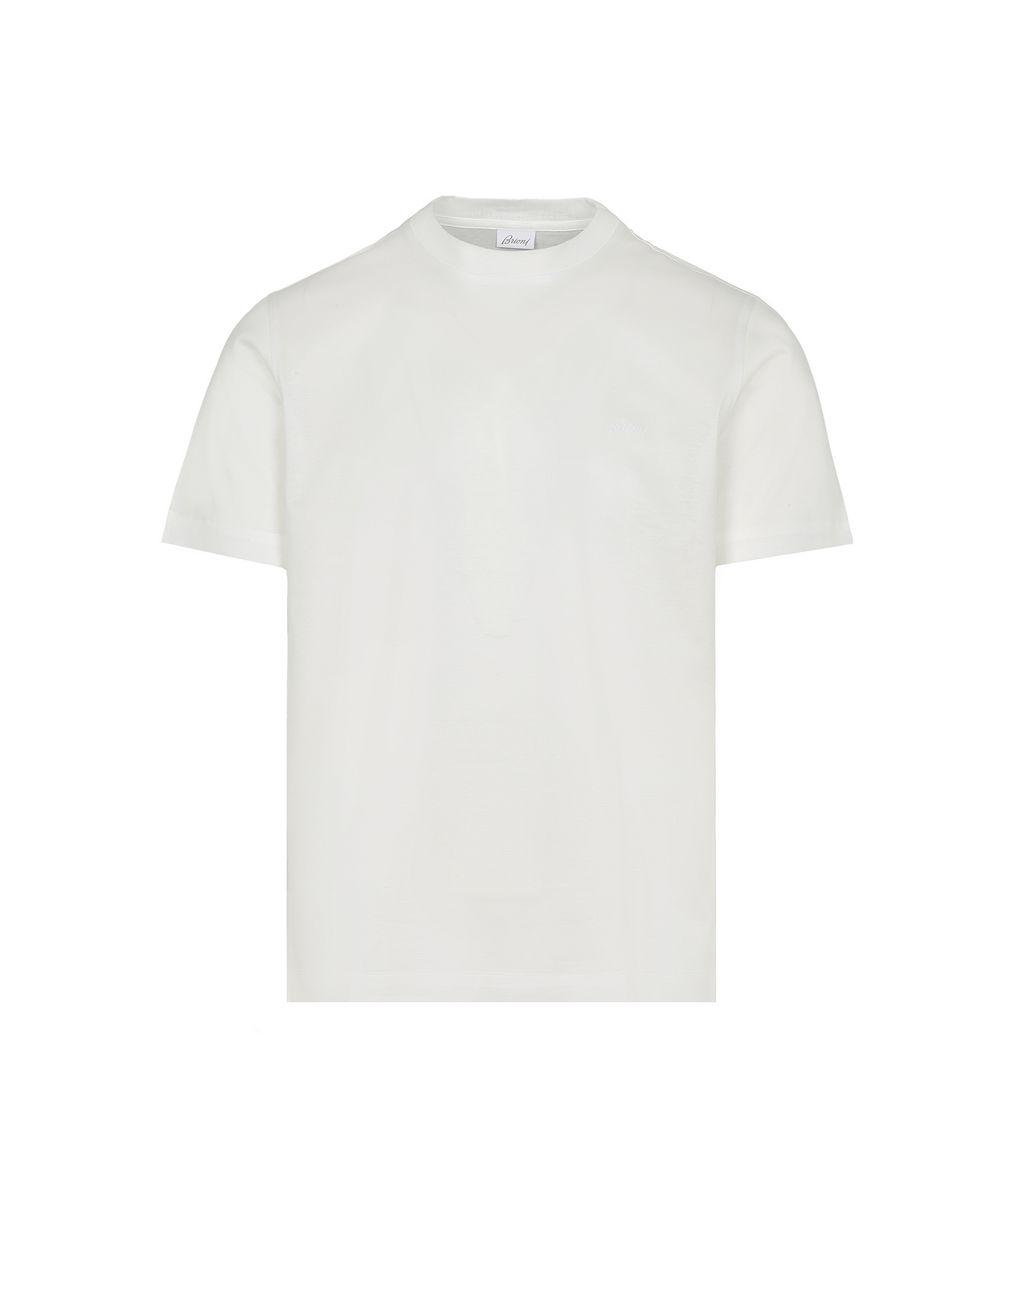 BRIONI White Crew Neck T-Shirt T-Shirts & Polos Man f